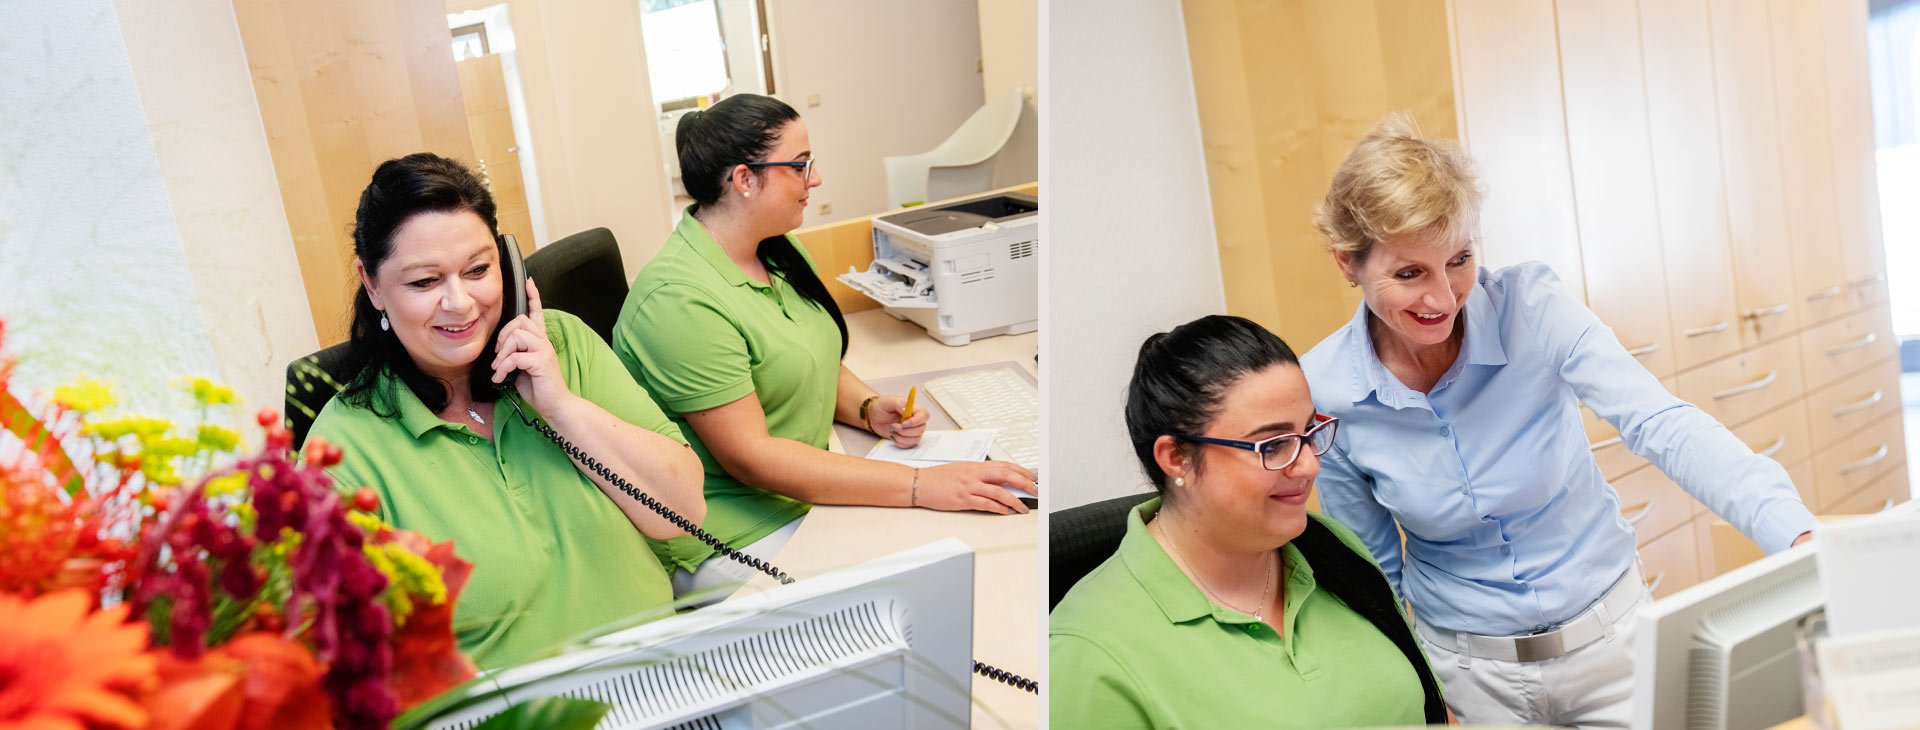 Frauenarzt Praxis Dr. Dorothee Higgins Alfter Team